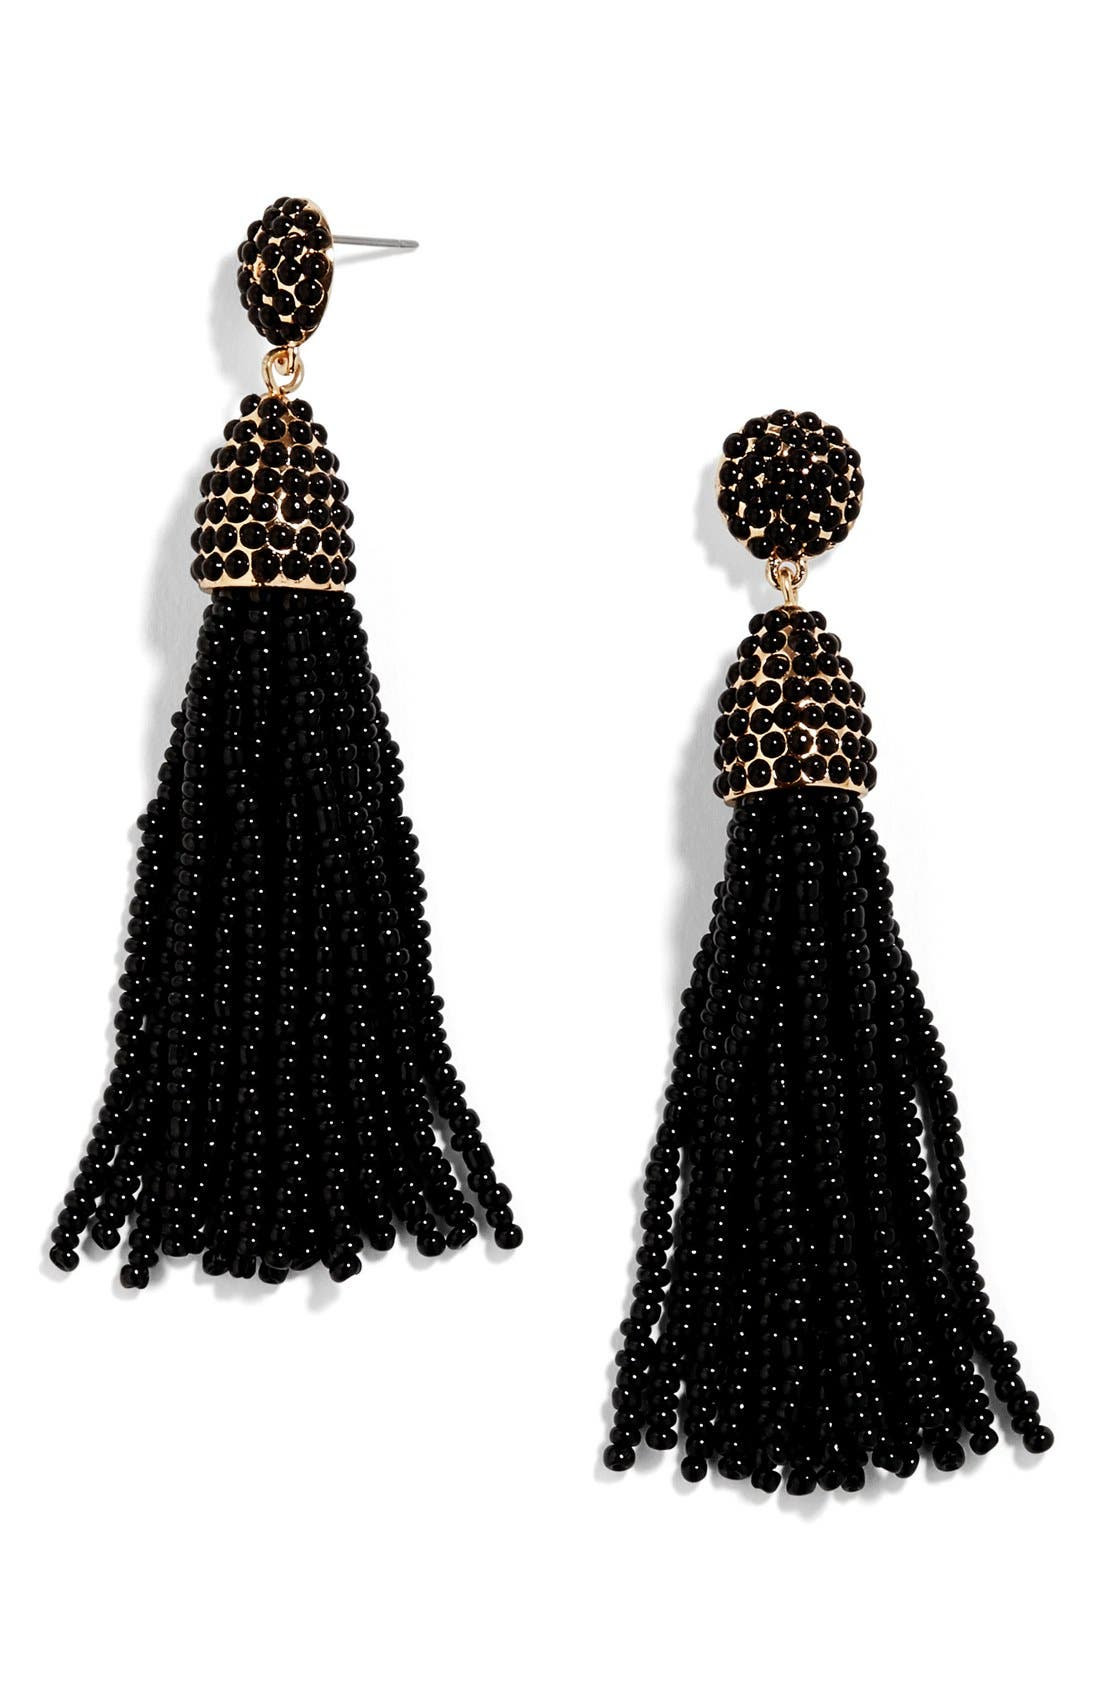 Alternate Image 1 Selected - BaubleBar 'Piñata' Tassel Earrings